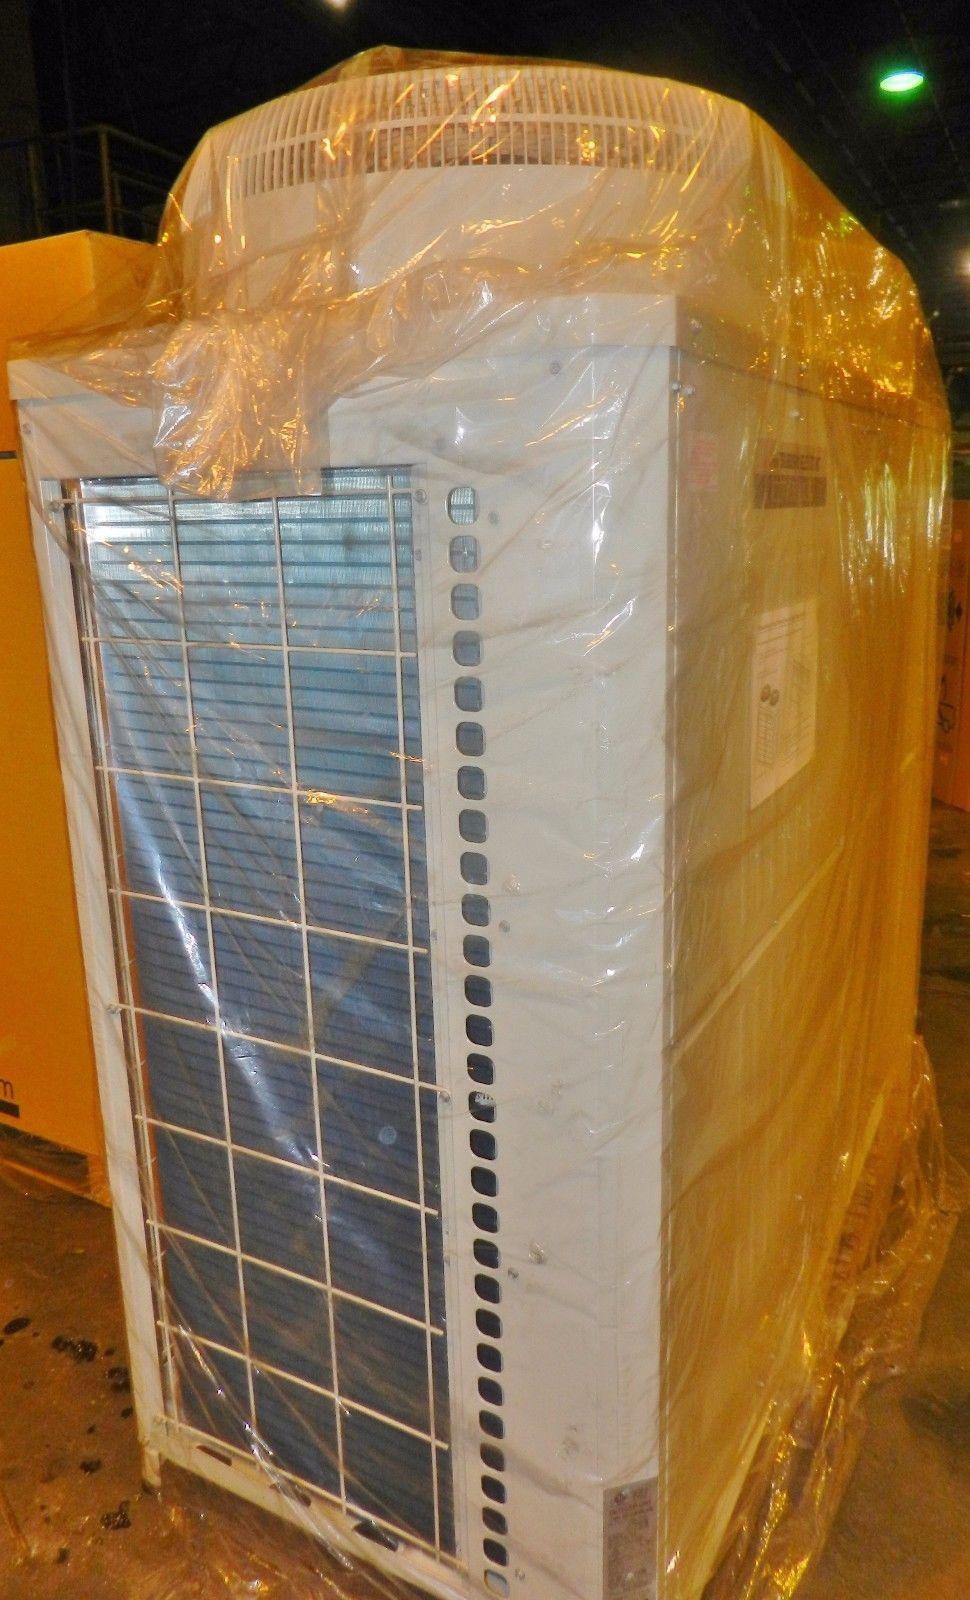 Lot 43 - Mitsubishi 10 Ton Air Conditioner Outdoor Unit